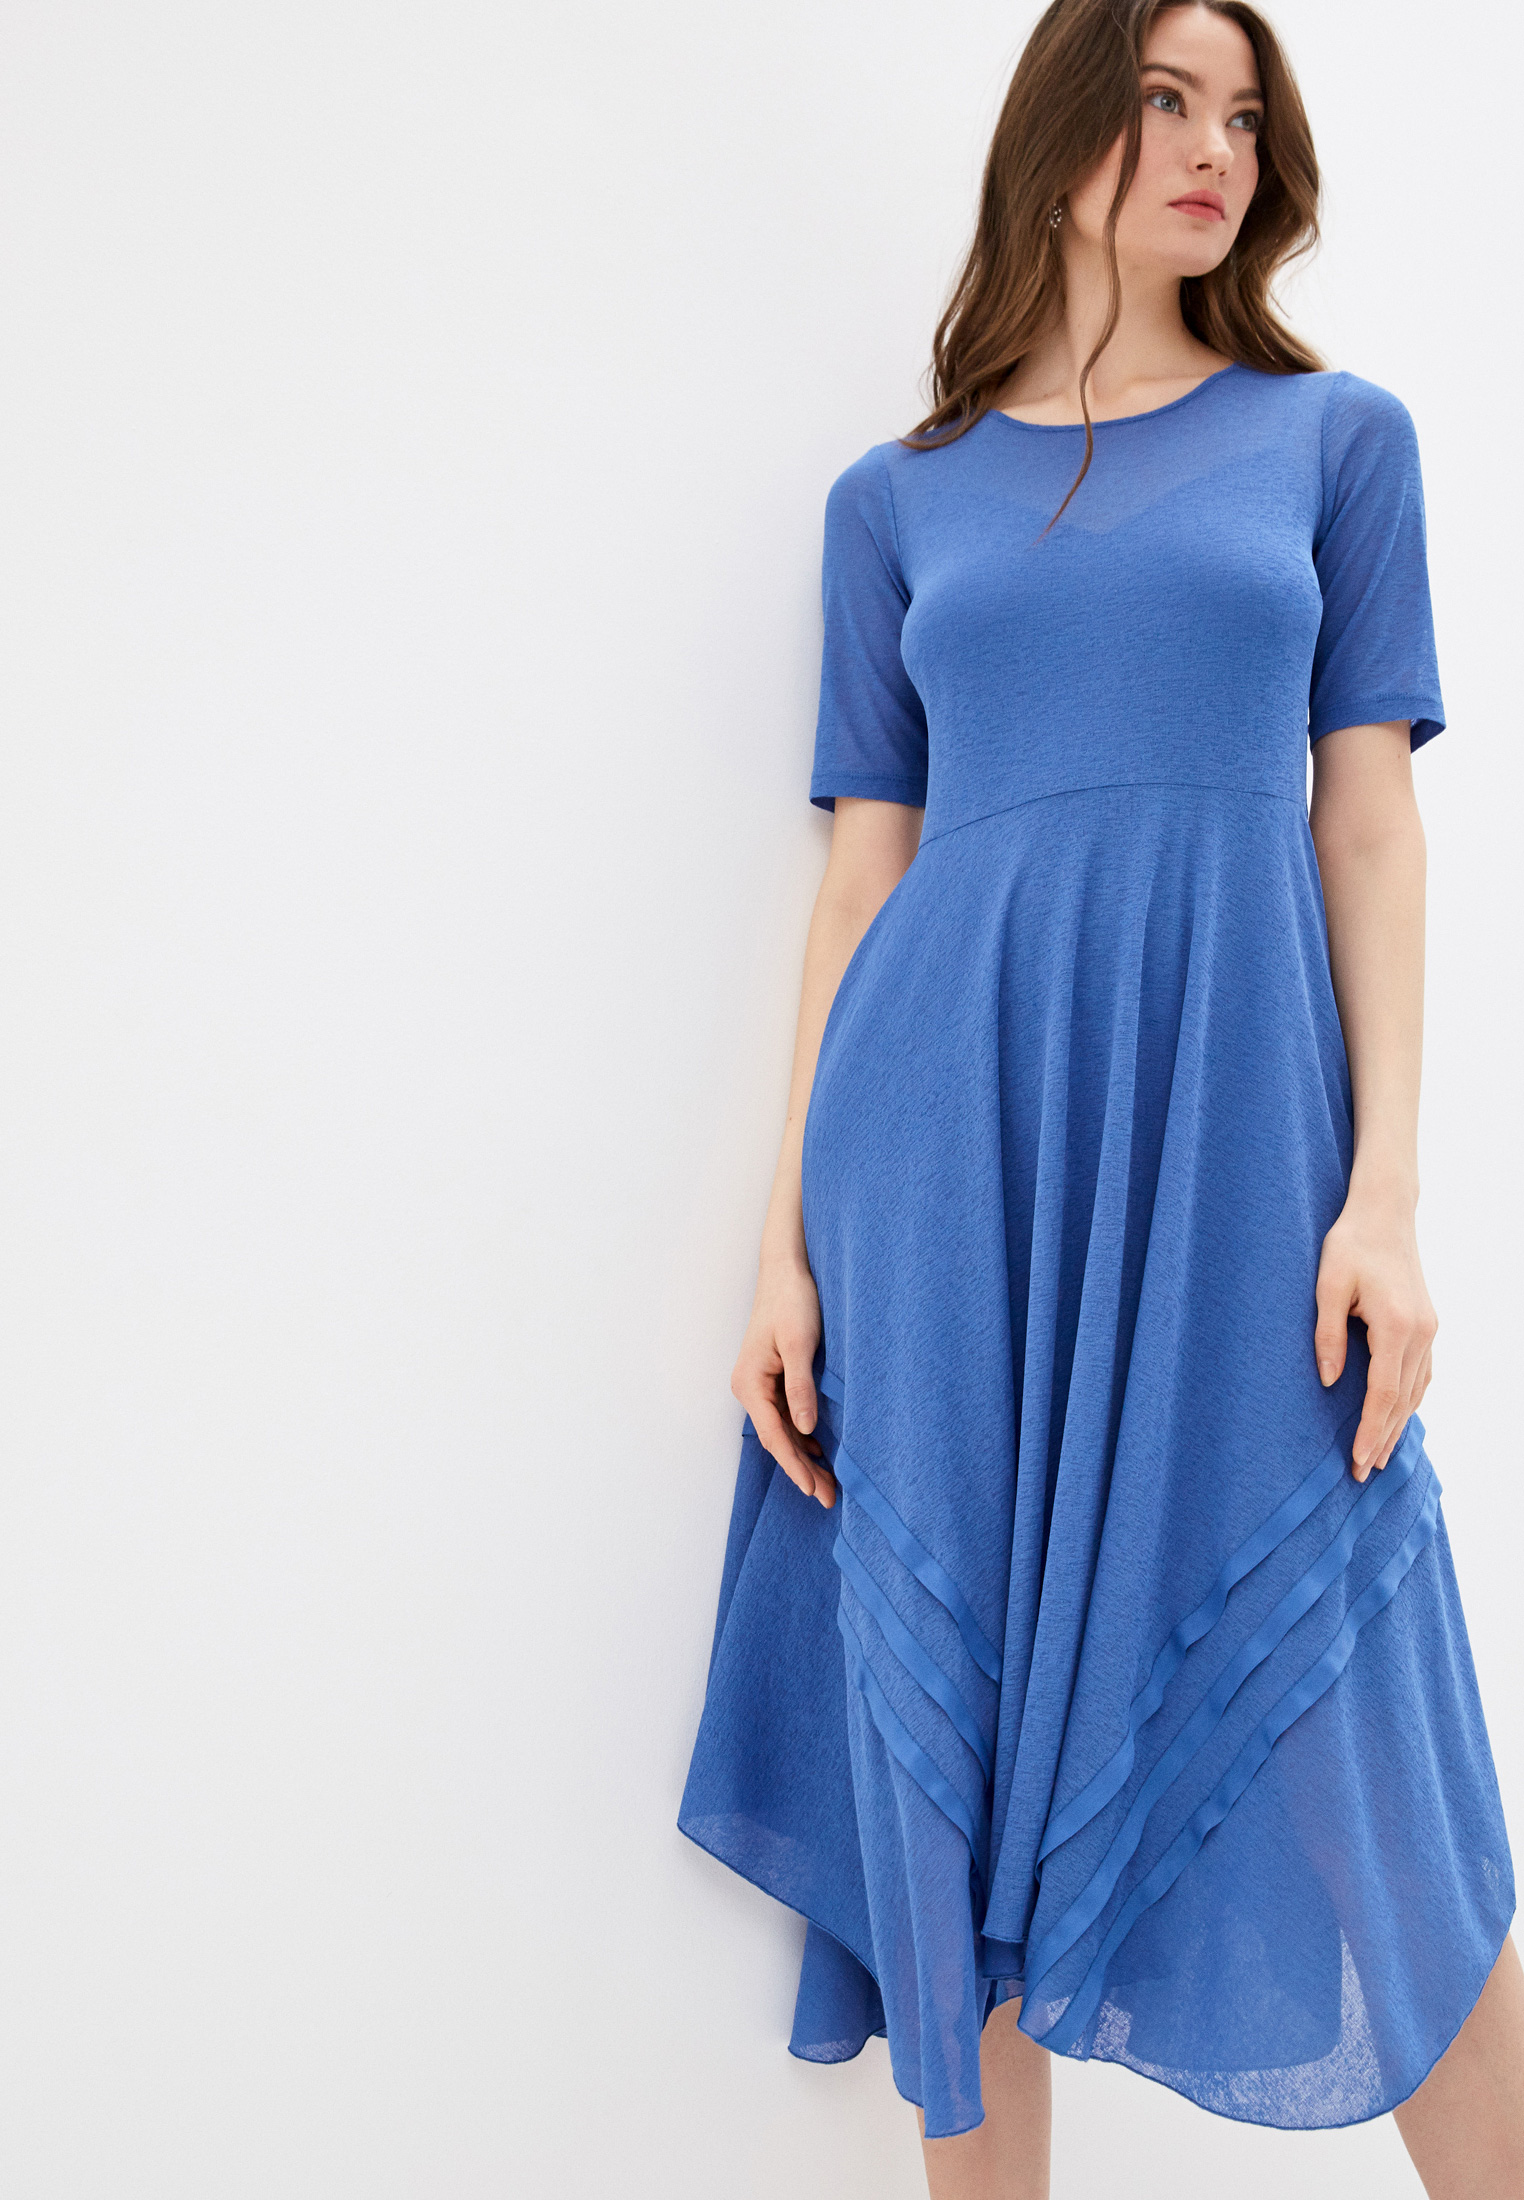 Повседневное платье See By Chloe (Си бай Хлое) chS20SJR07